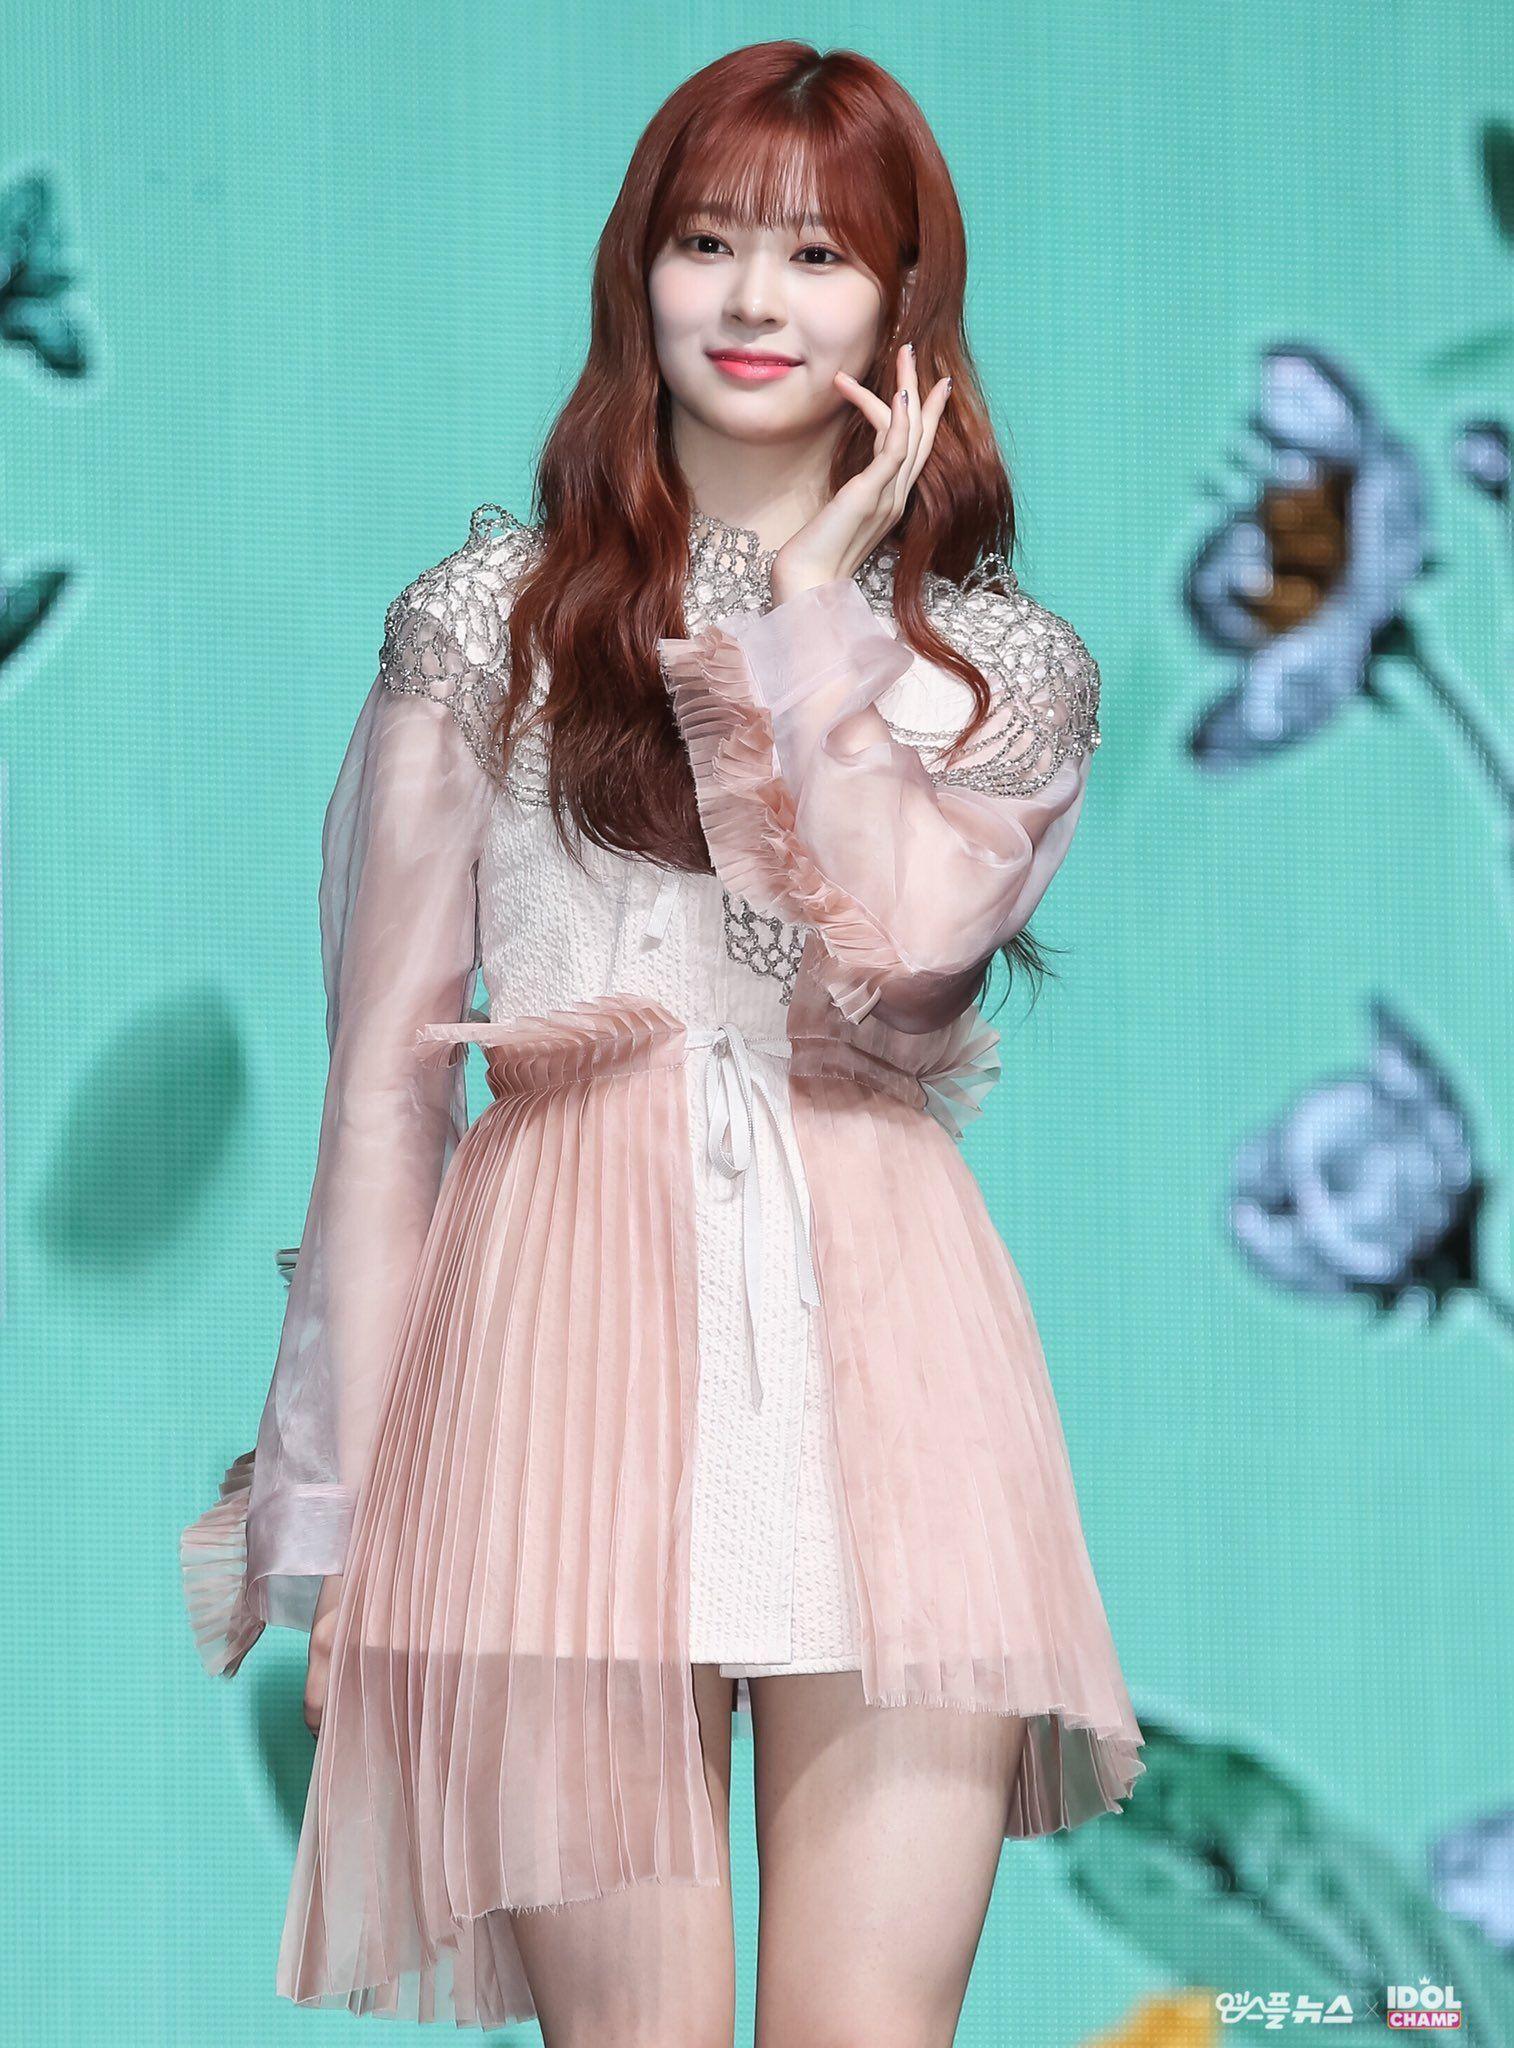 Izone Pics Heartiz ˎˊ On Twitter Kpop Outfits Fashion Pop Fashion